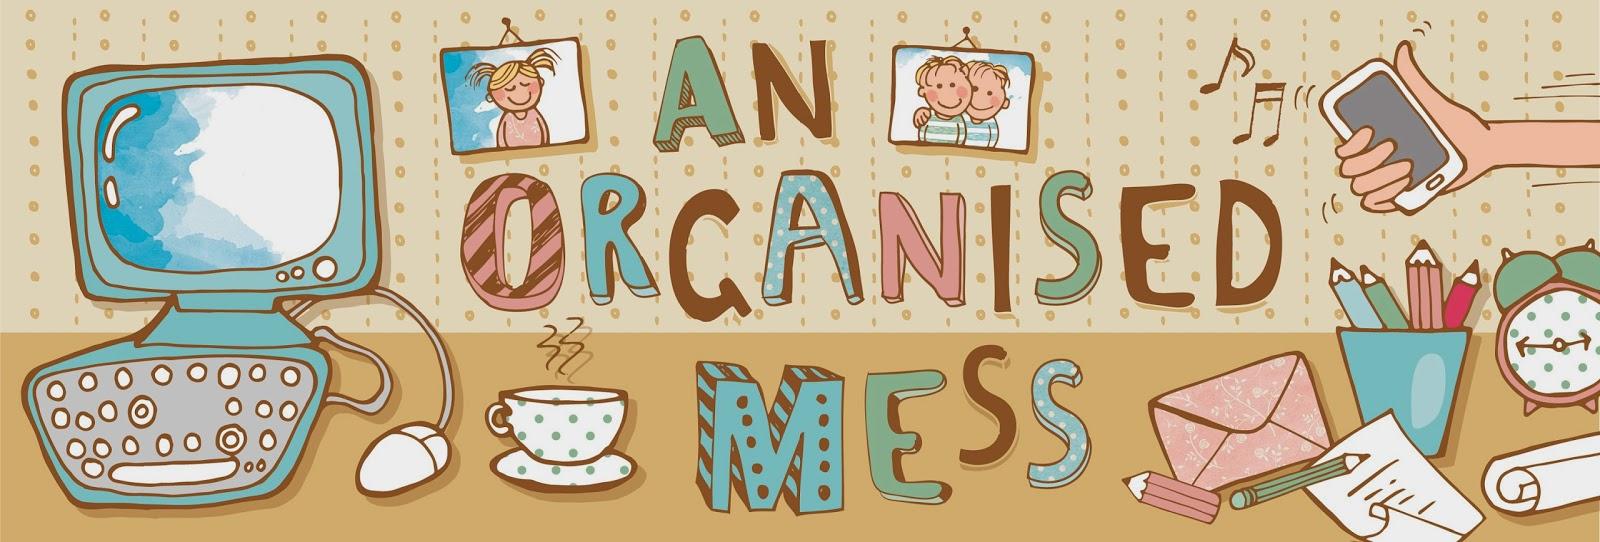 www.anorganisedmess.com